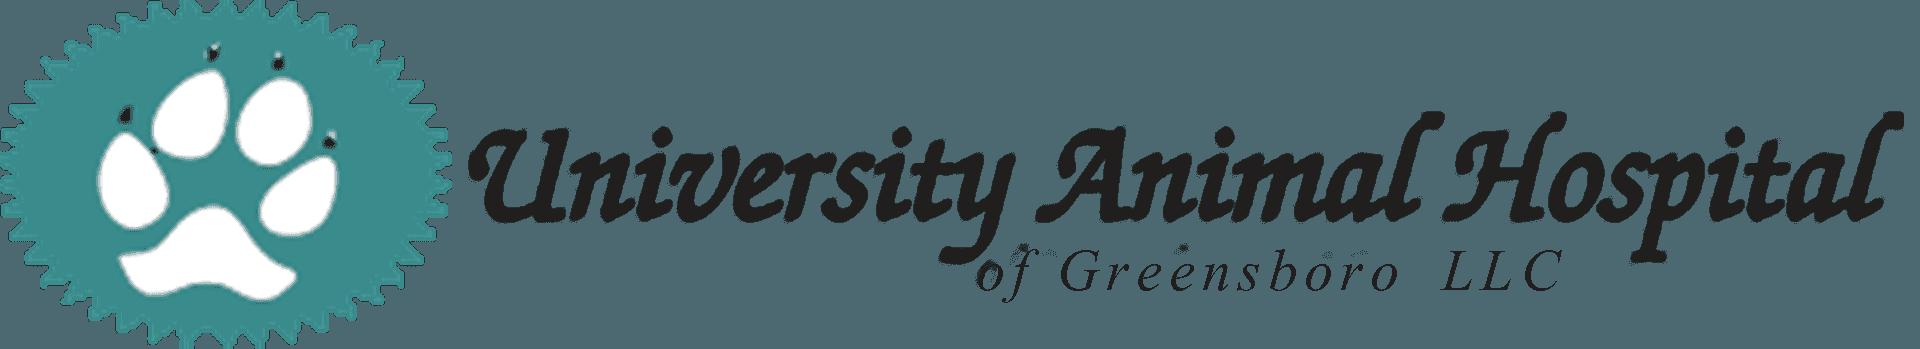 University Animal Hospital - Greensboro, NC